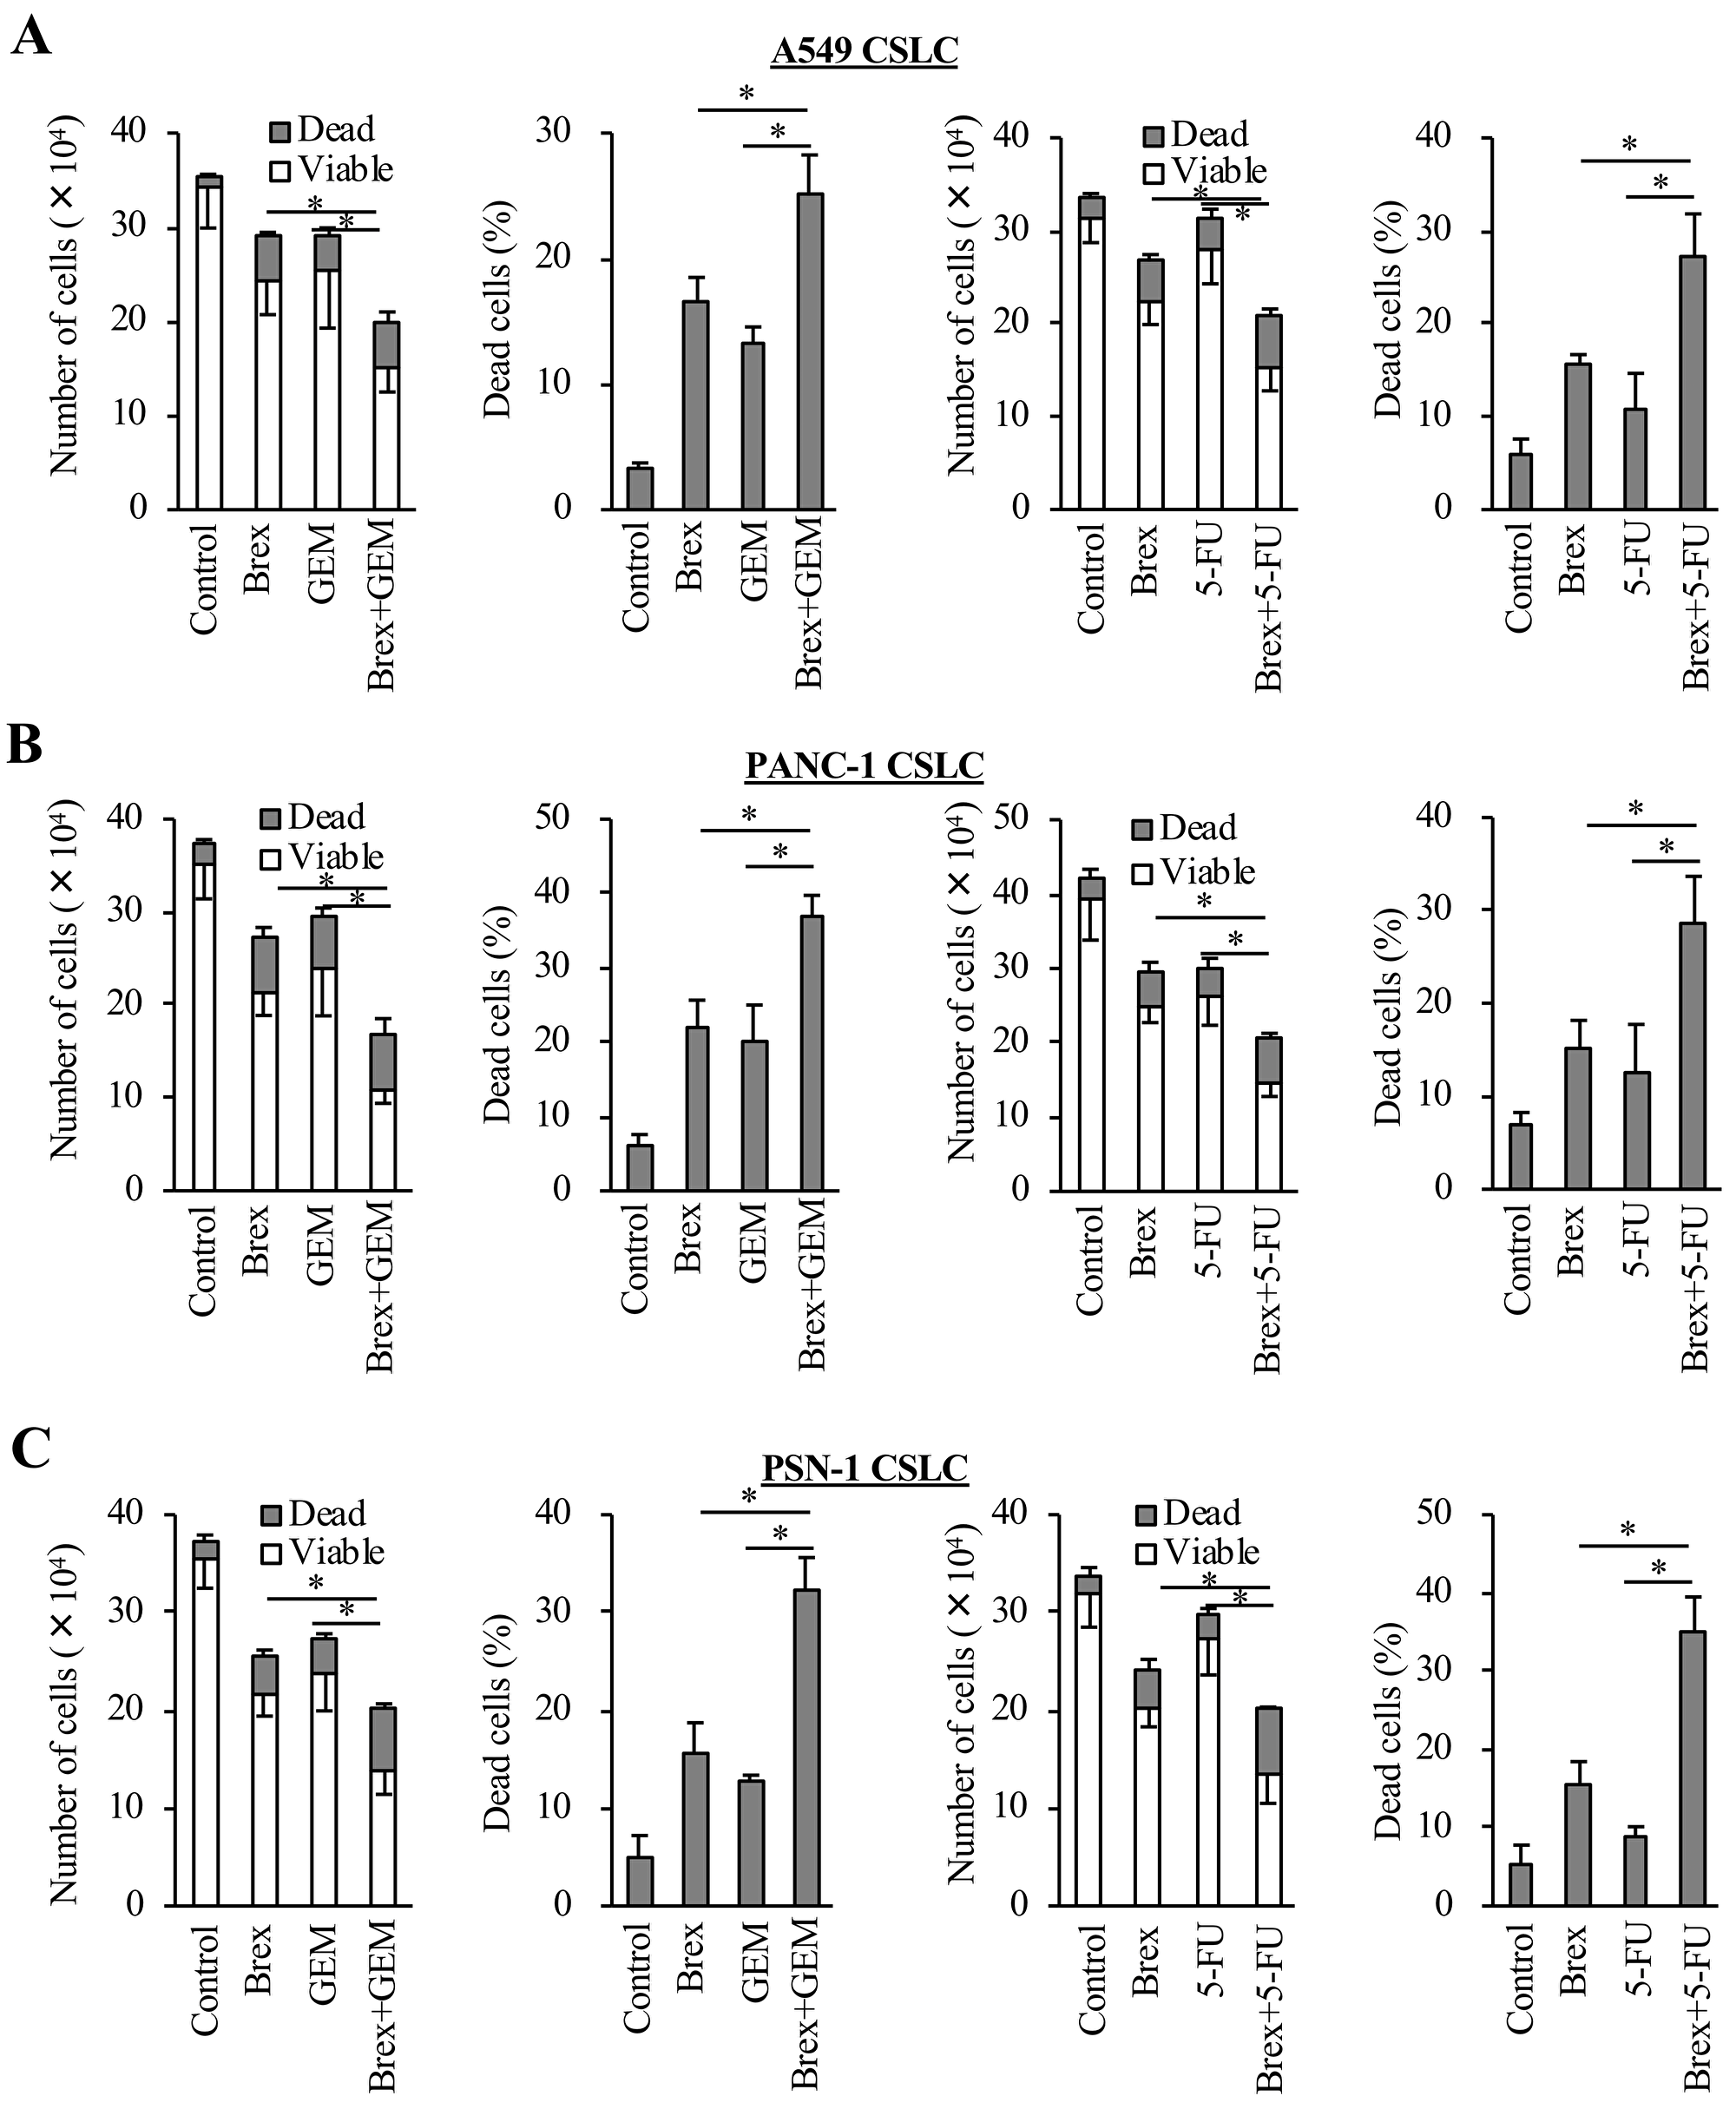 Brexpiprazole sensitizes CSCs to cytotoxic chemotherapeutic agents.